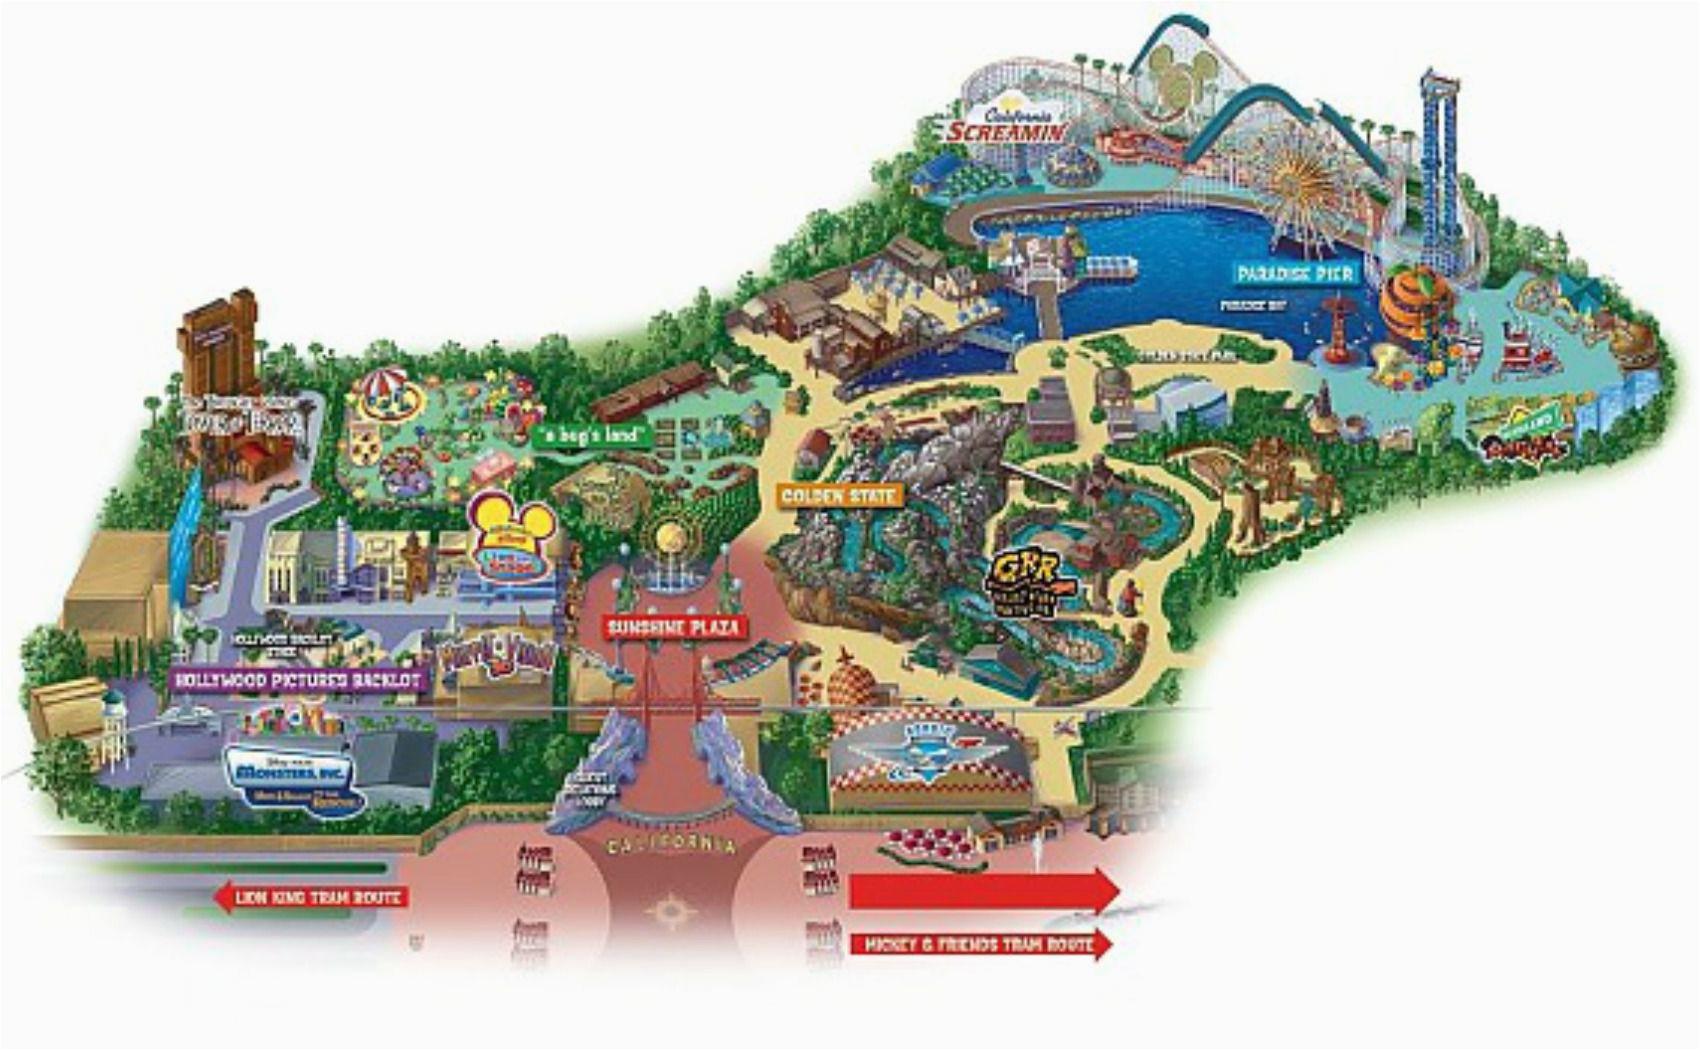 Disneyland California Adventure Map Map Of Disneyland California Adventure Park Maps Of Disneyland